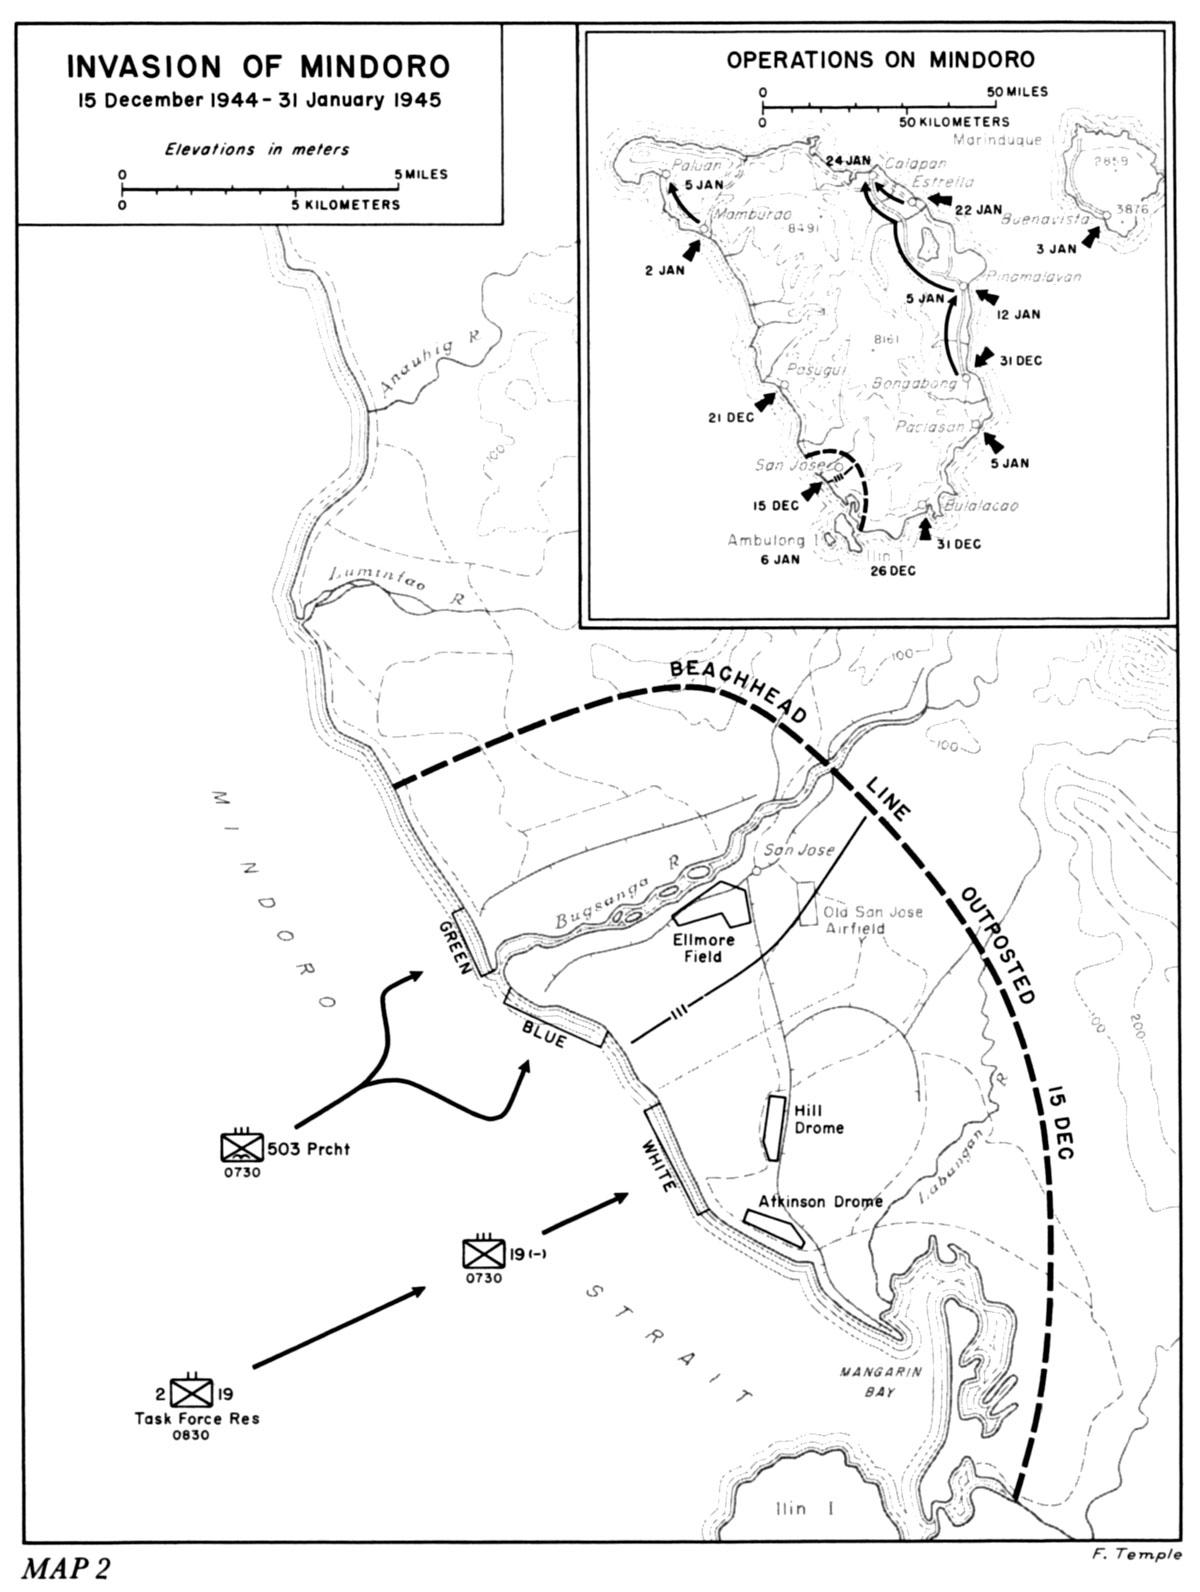 Invasion Of Mindoro 15 December 1944 31 January 1945